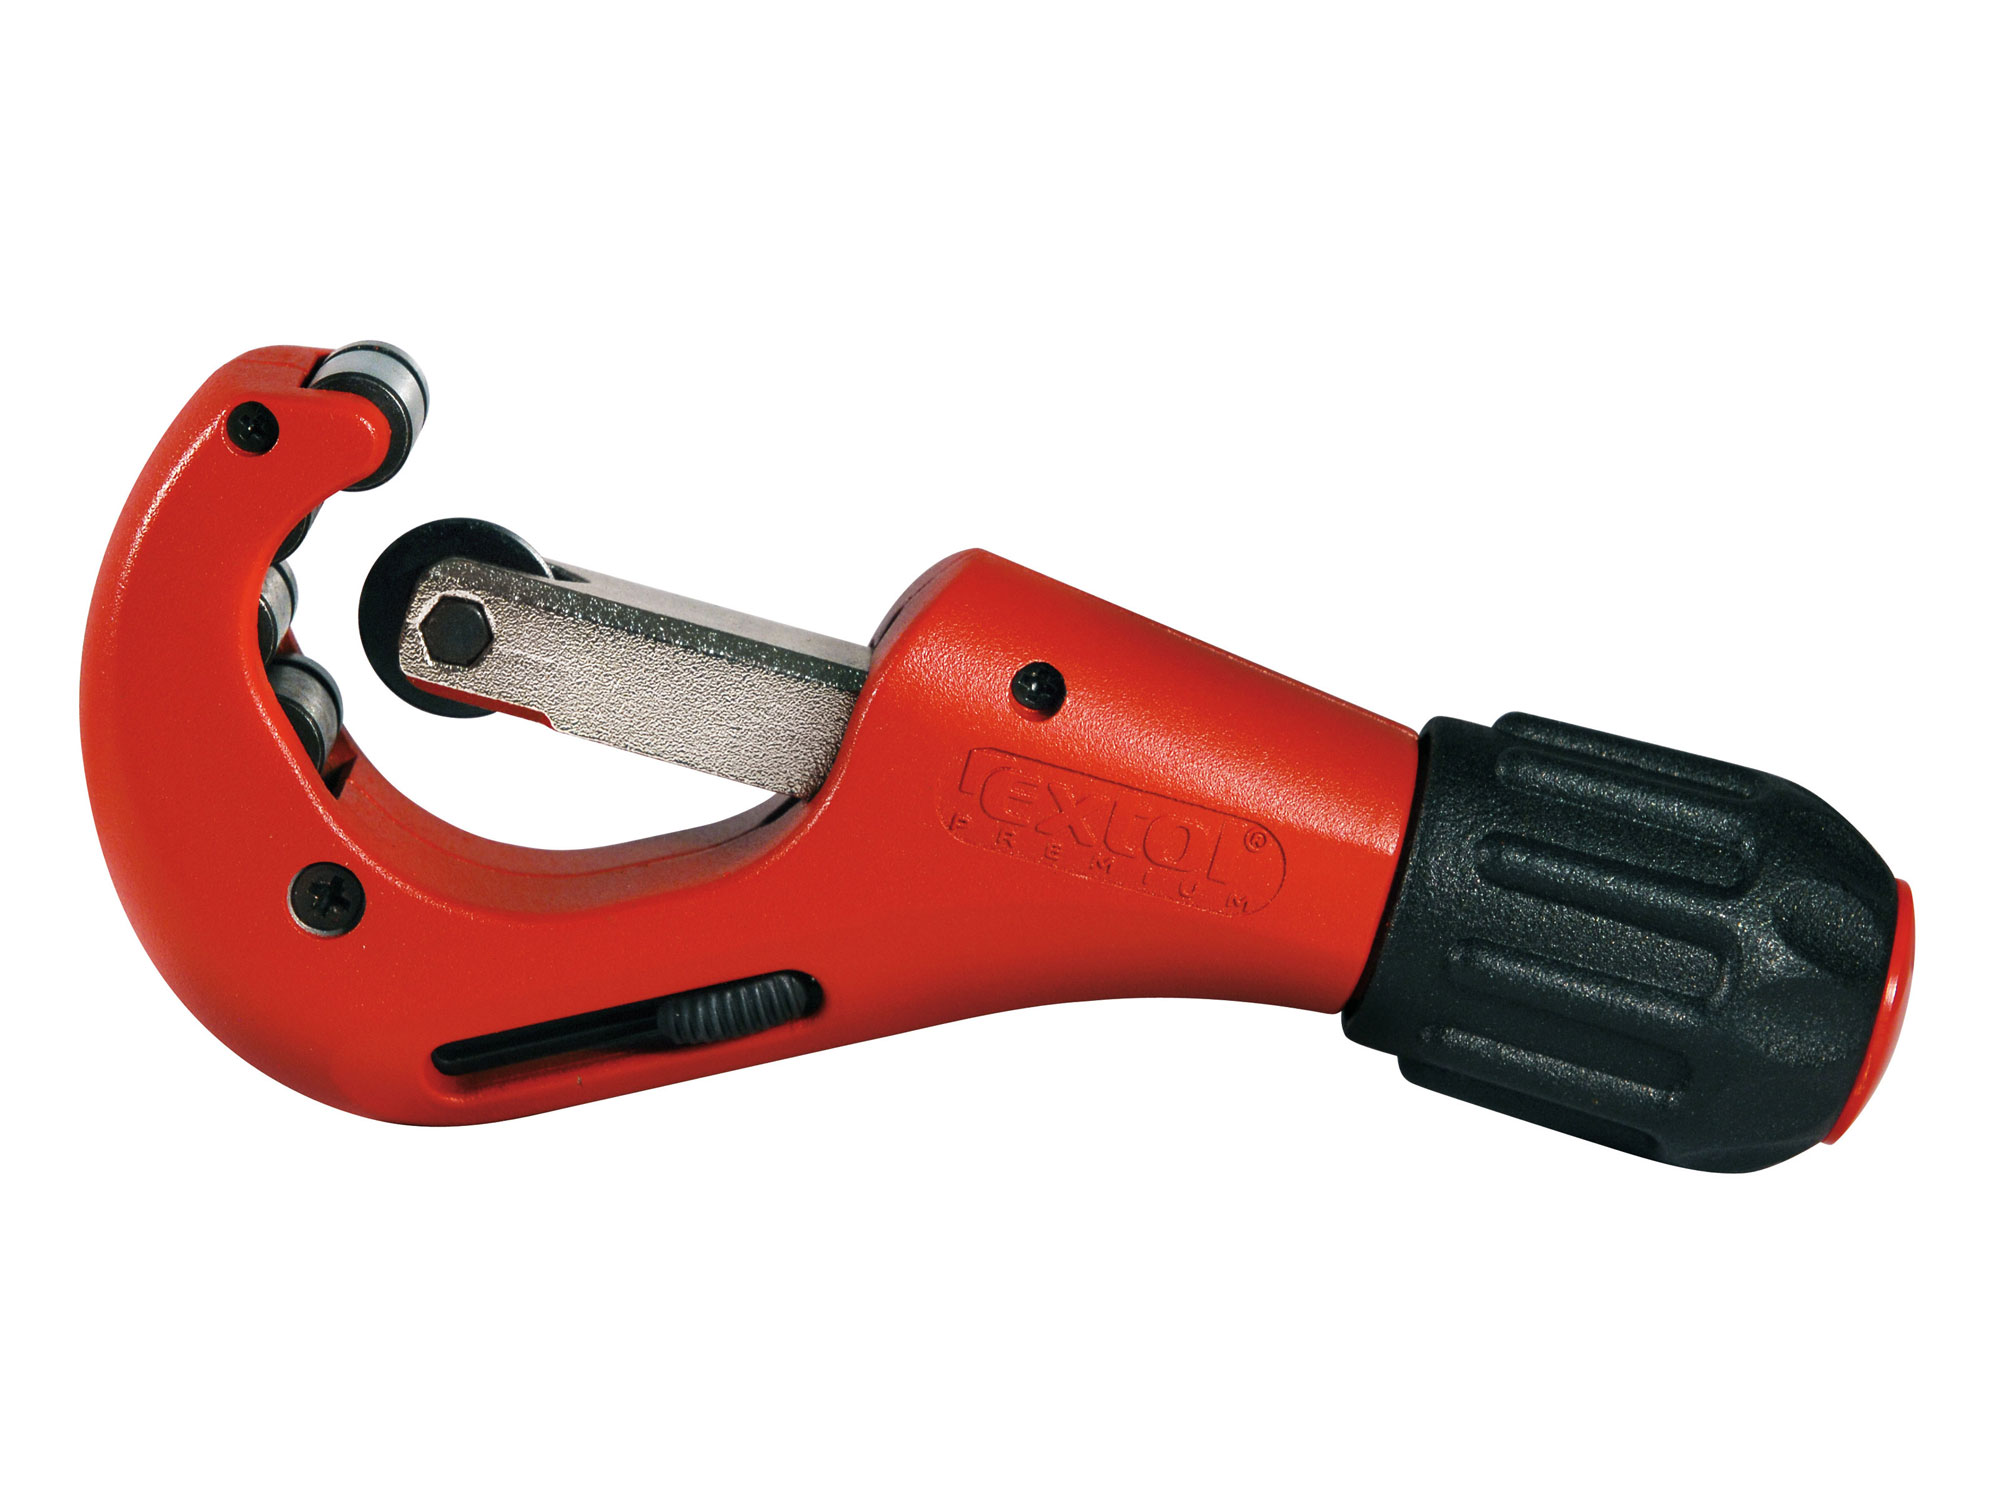 Řezač trubek s odhrotovačem, Ř3-35mm EXTOL PREMIUM 8848013